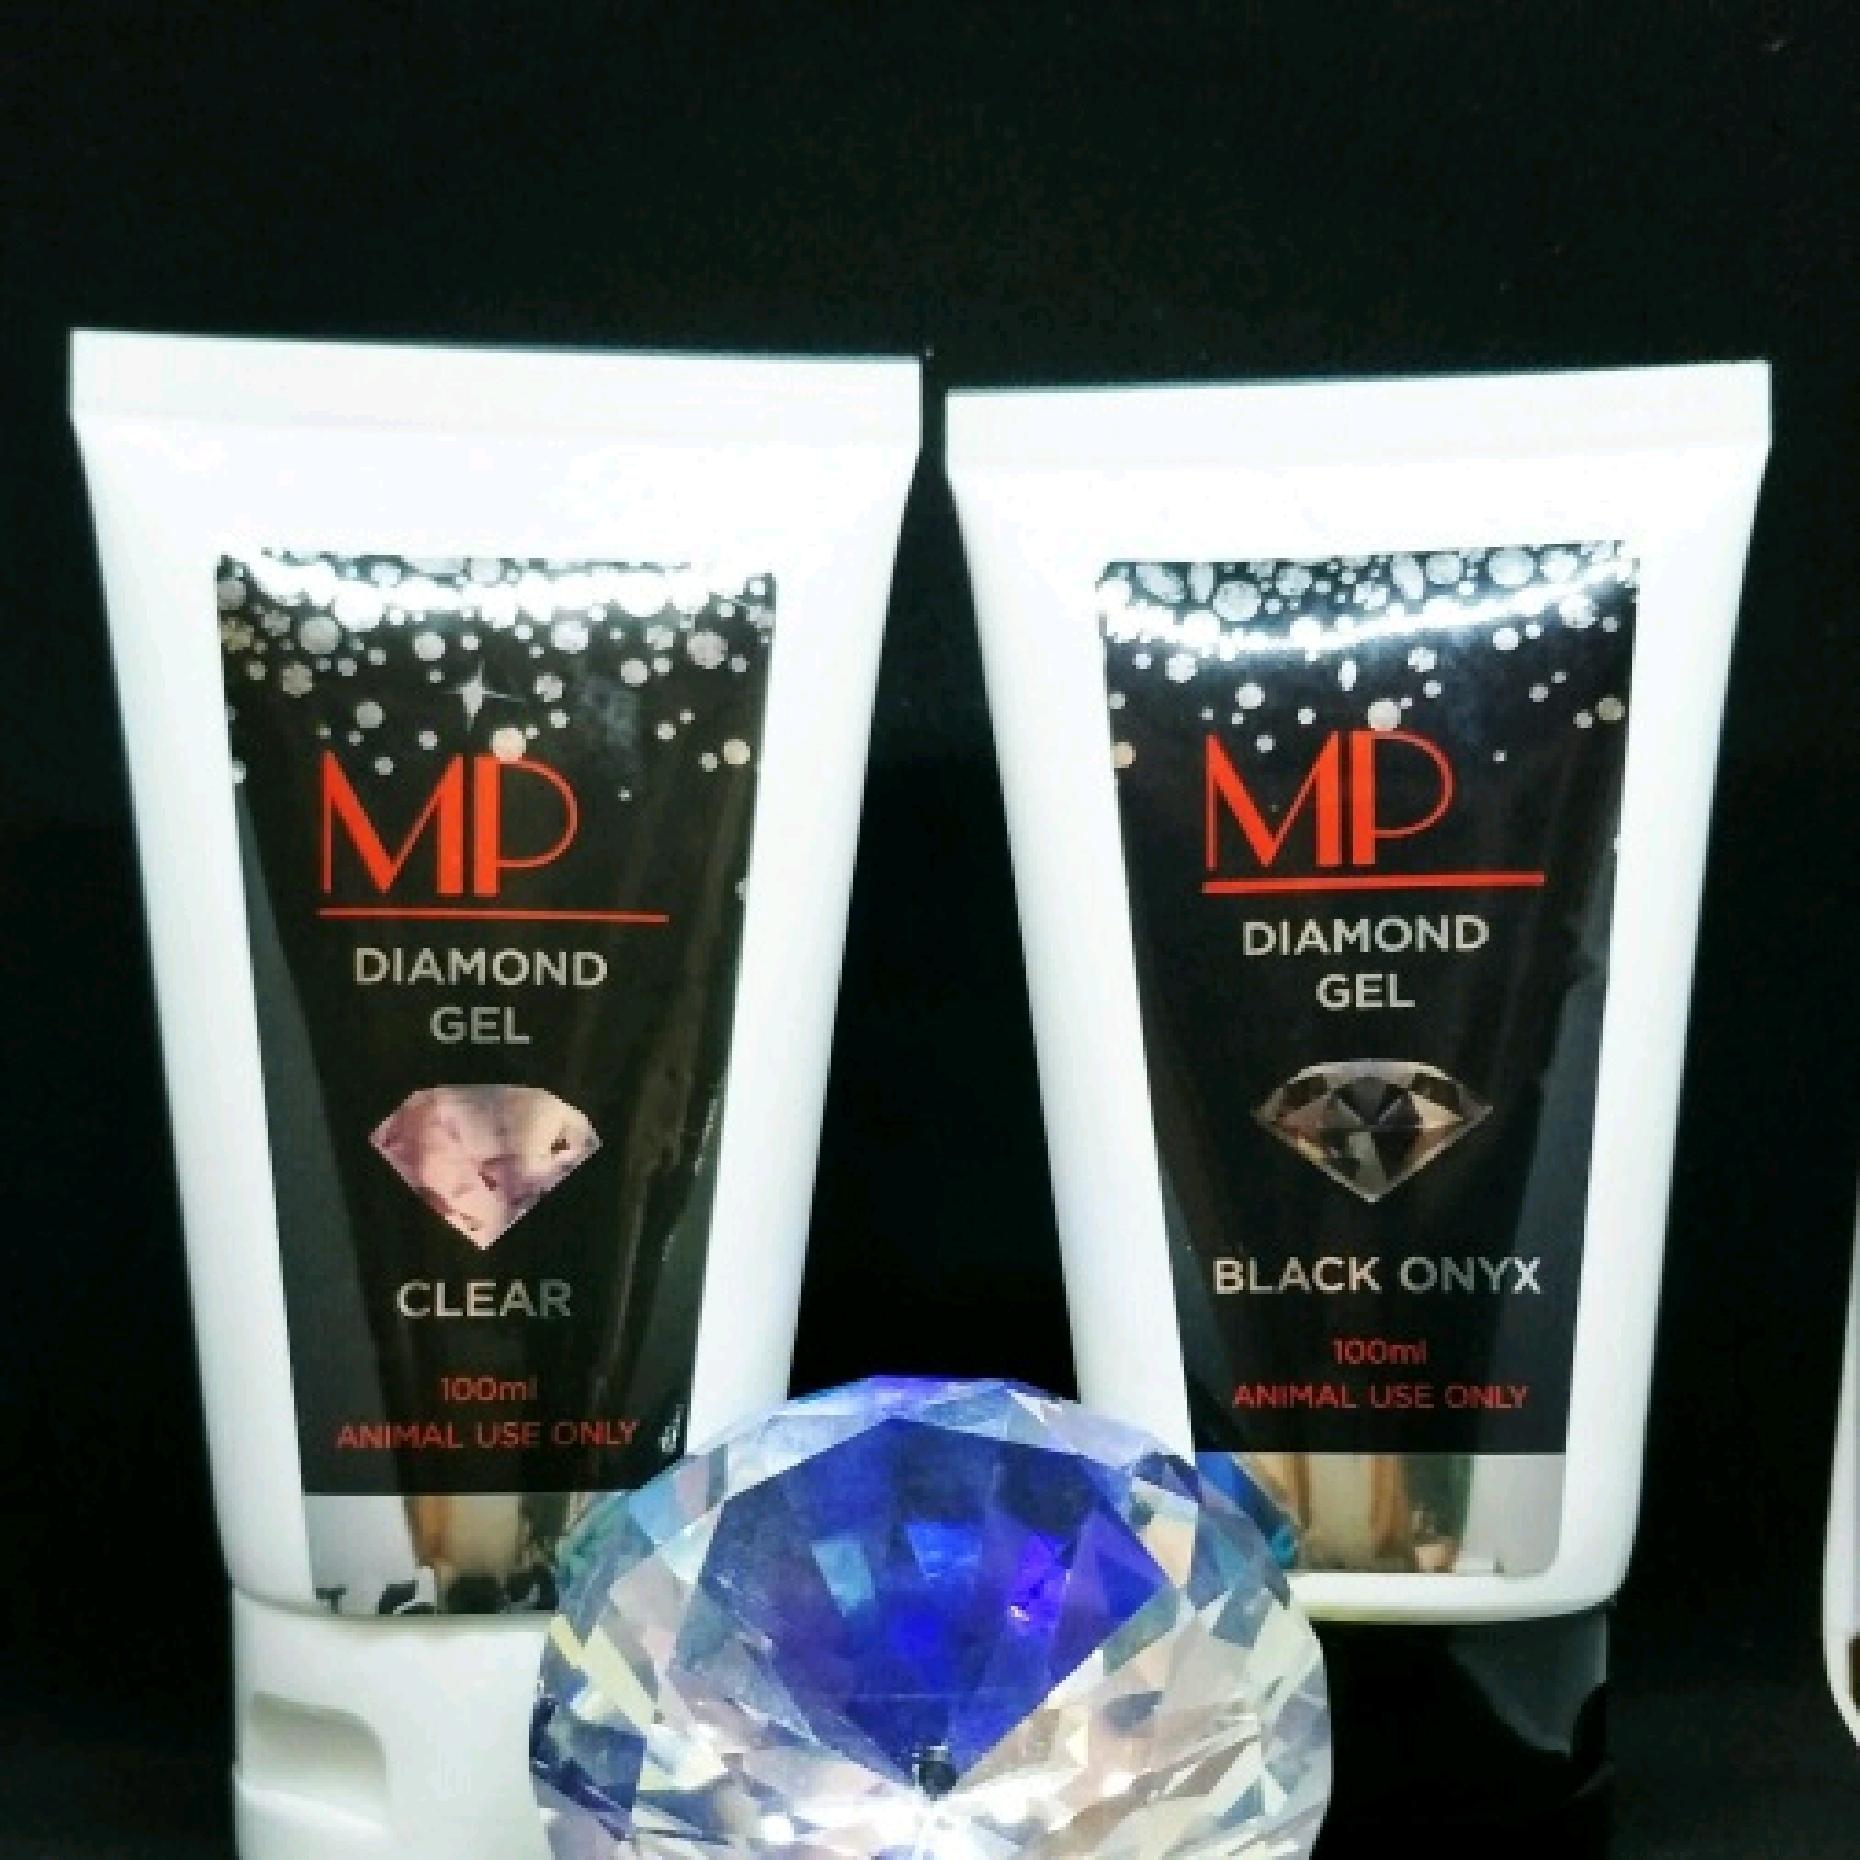 MP Diamond Gel